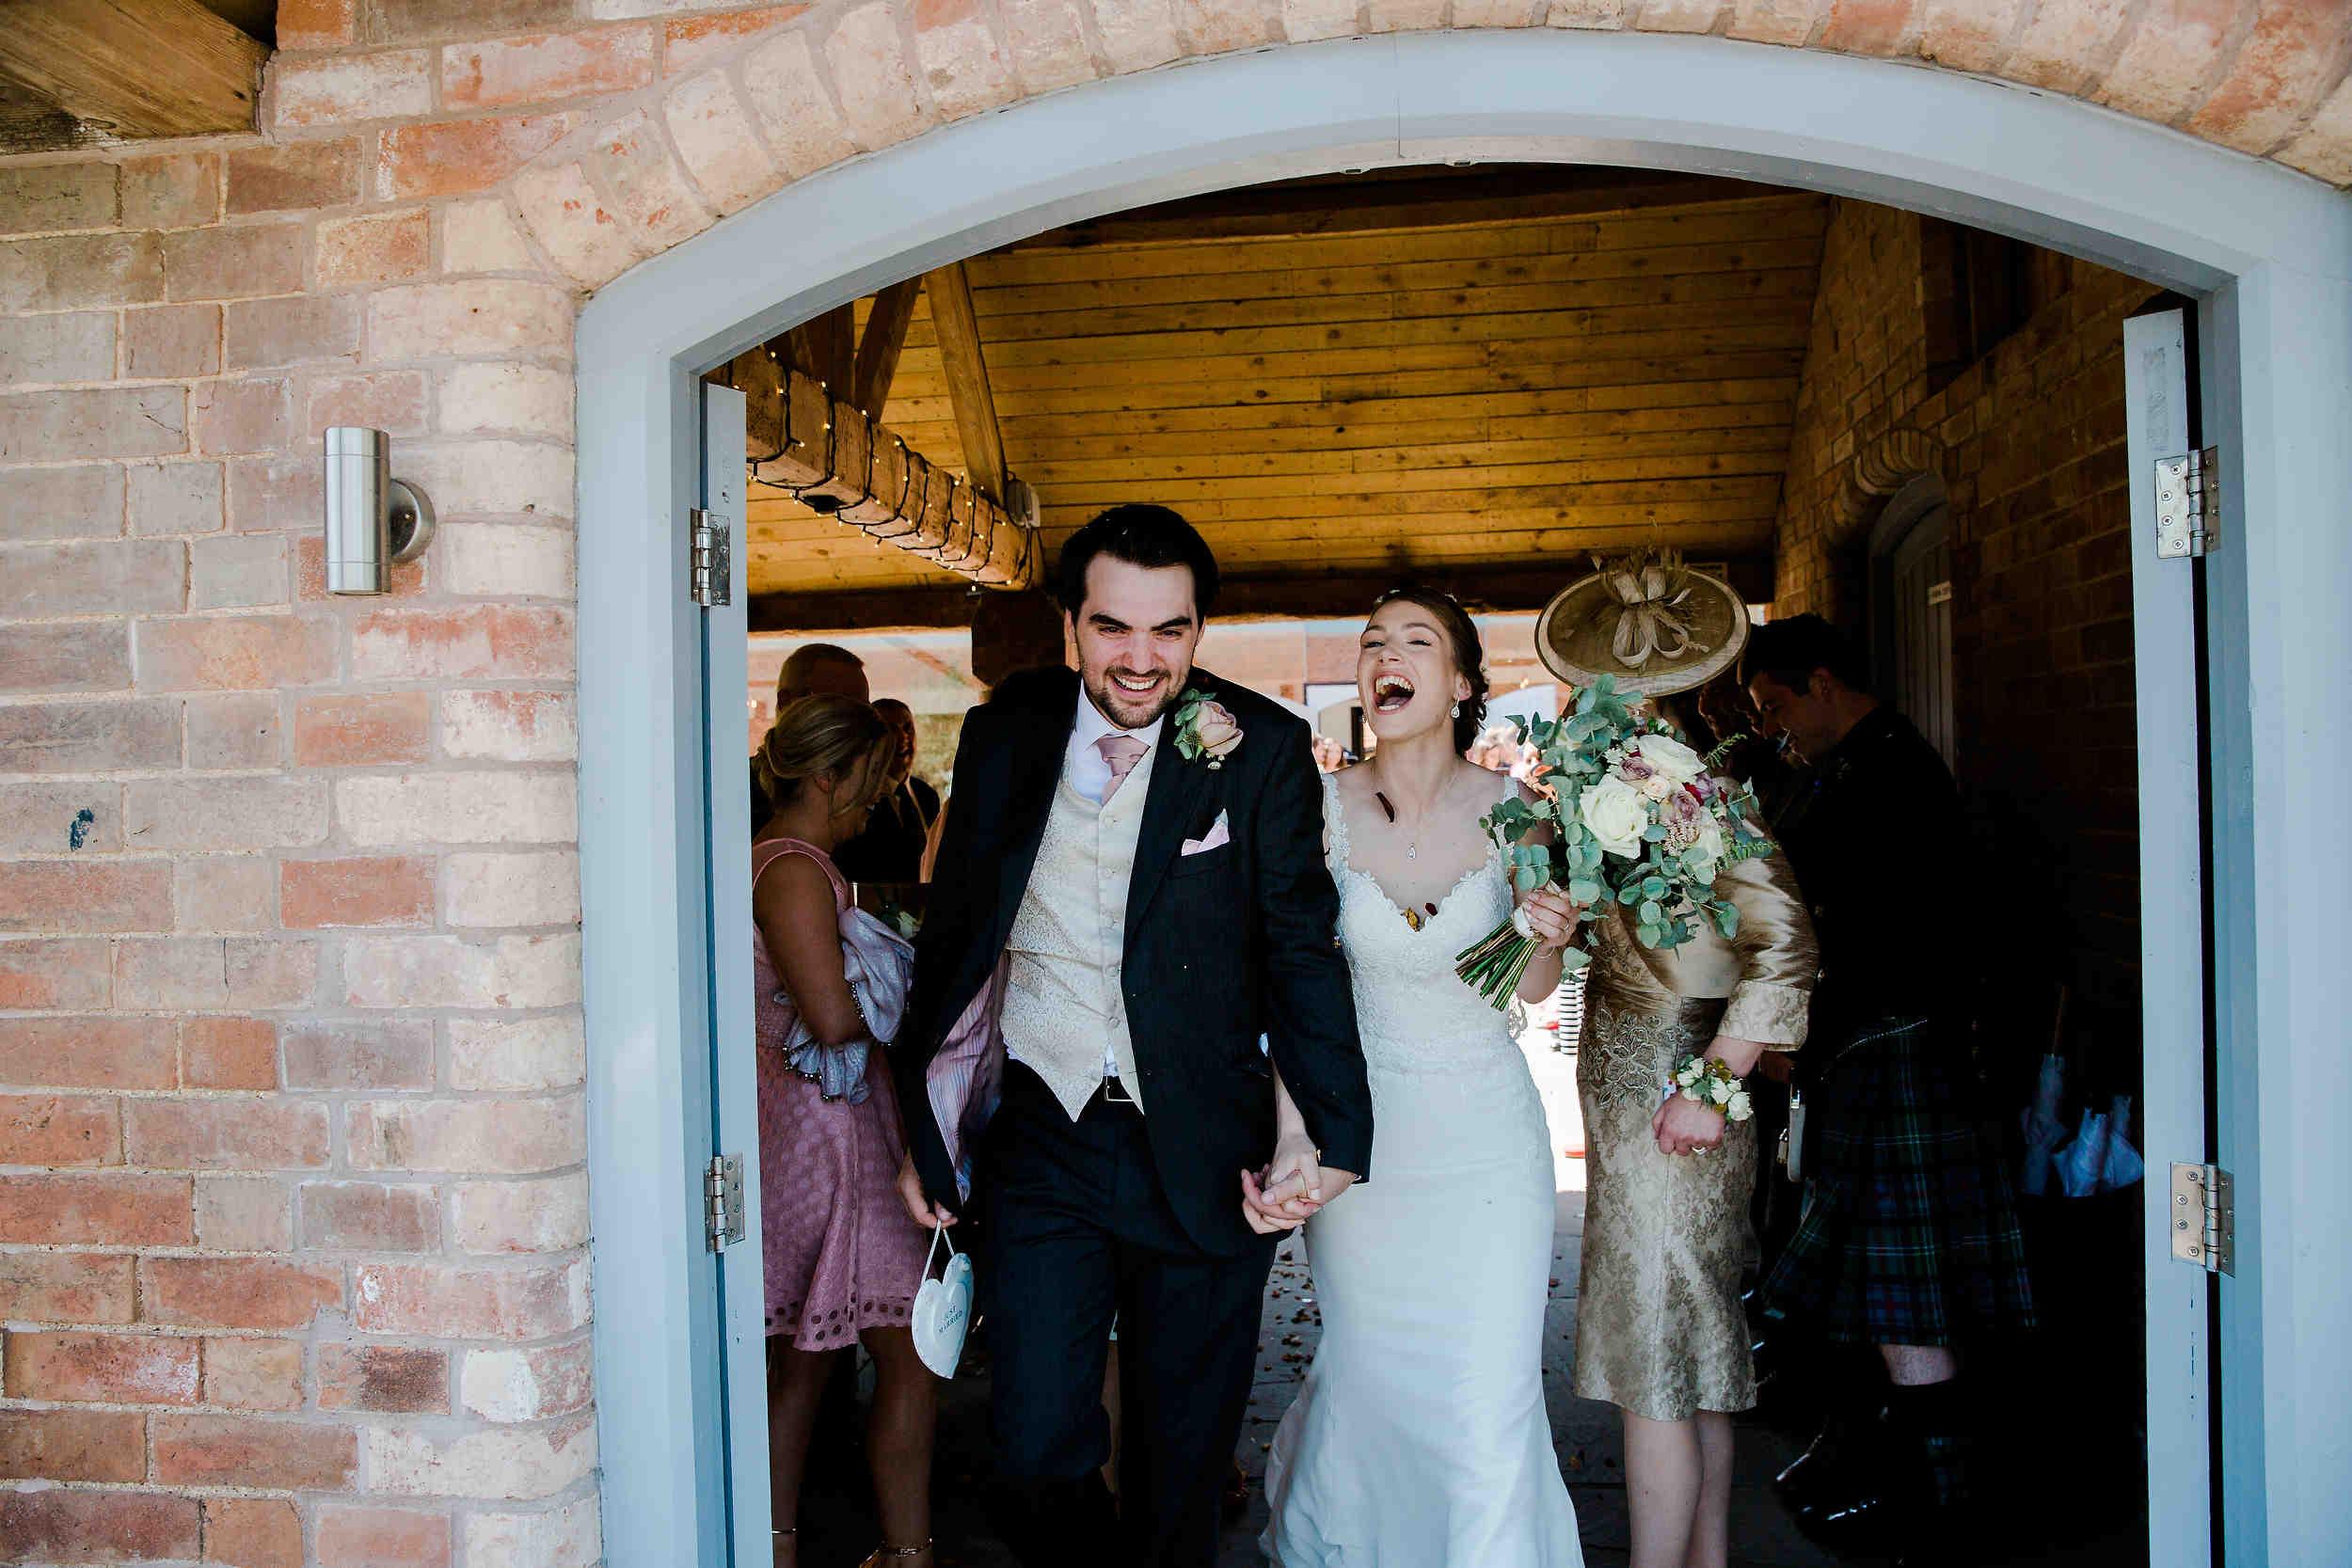 Modern_Stylish_Wedding_at_Swallows_Nest_Barn1196